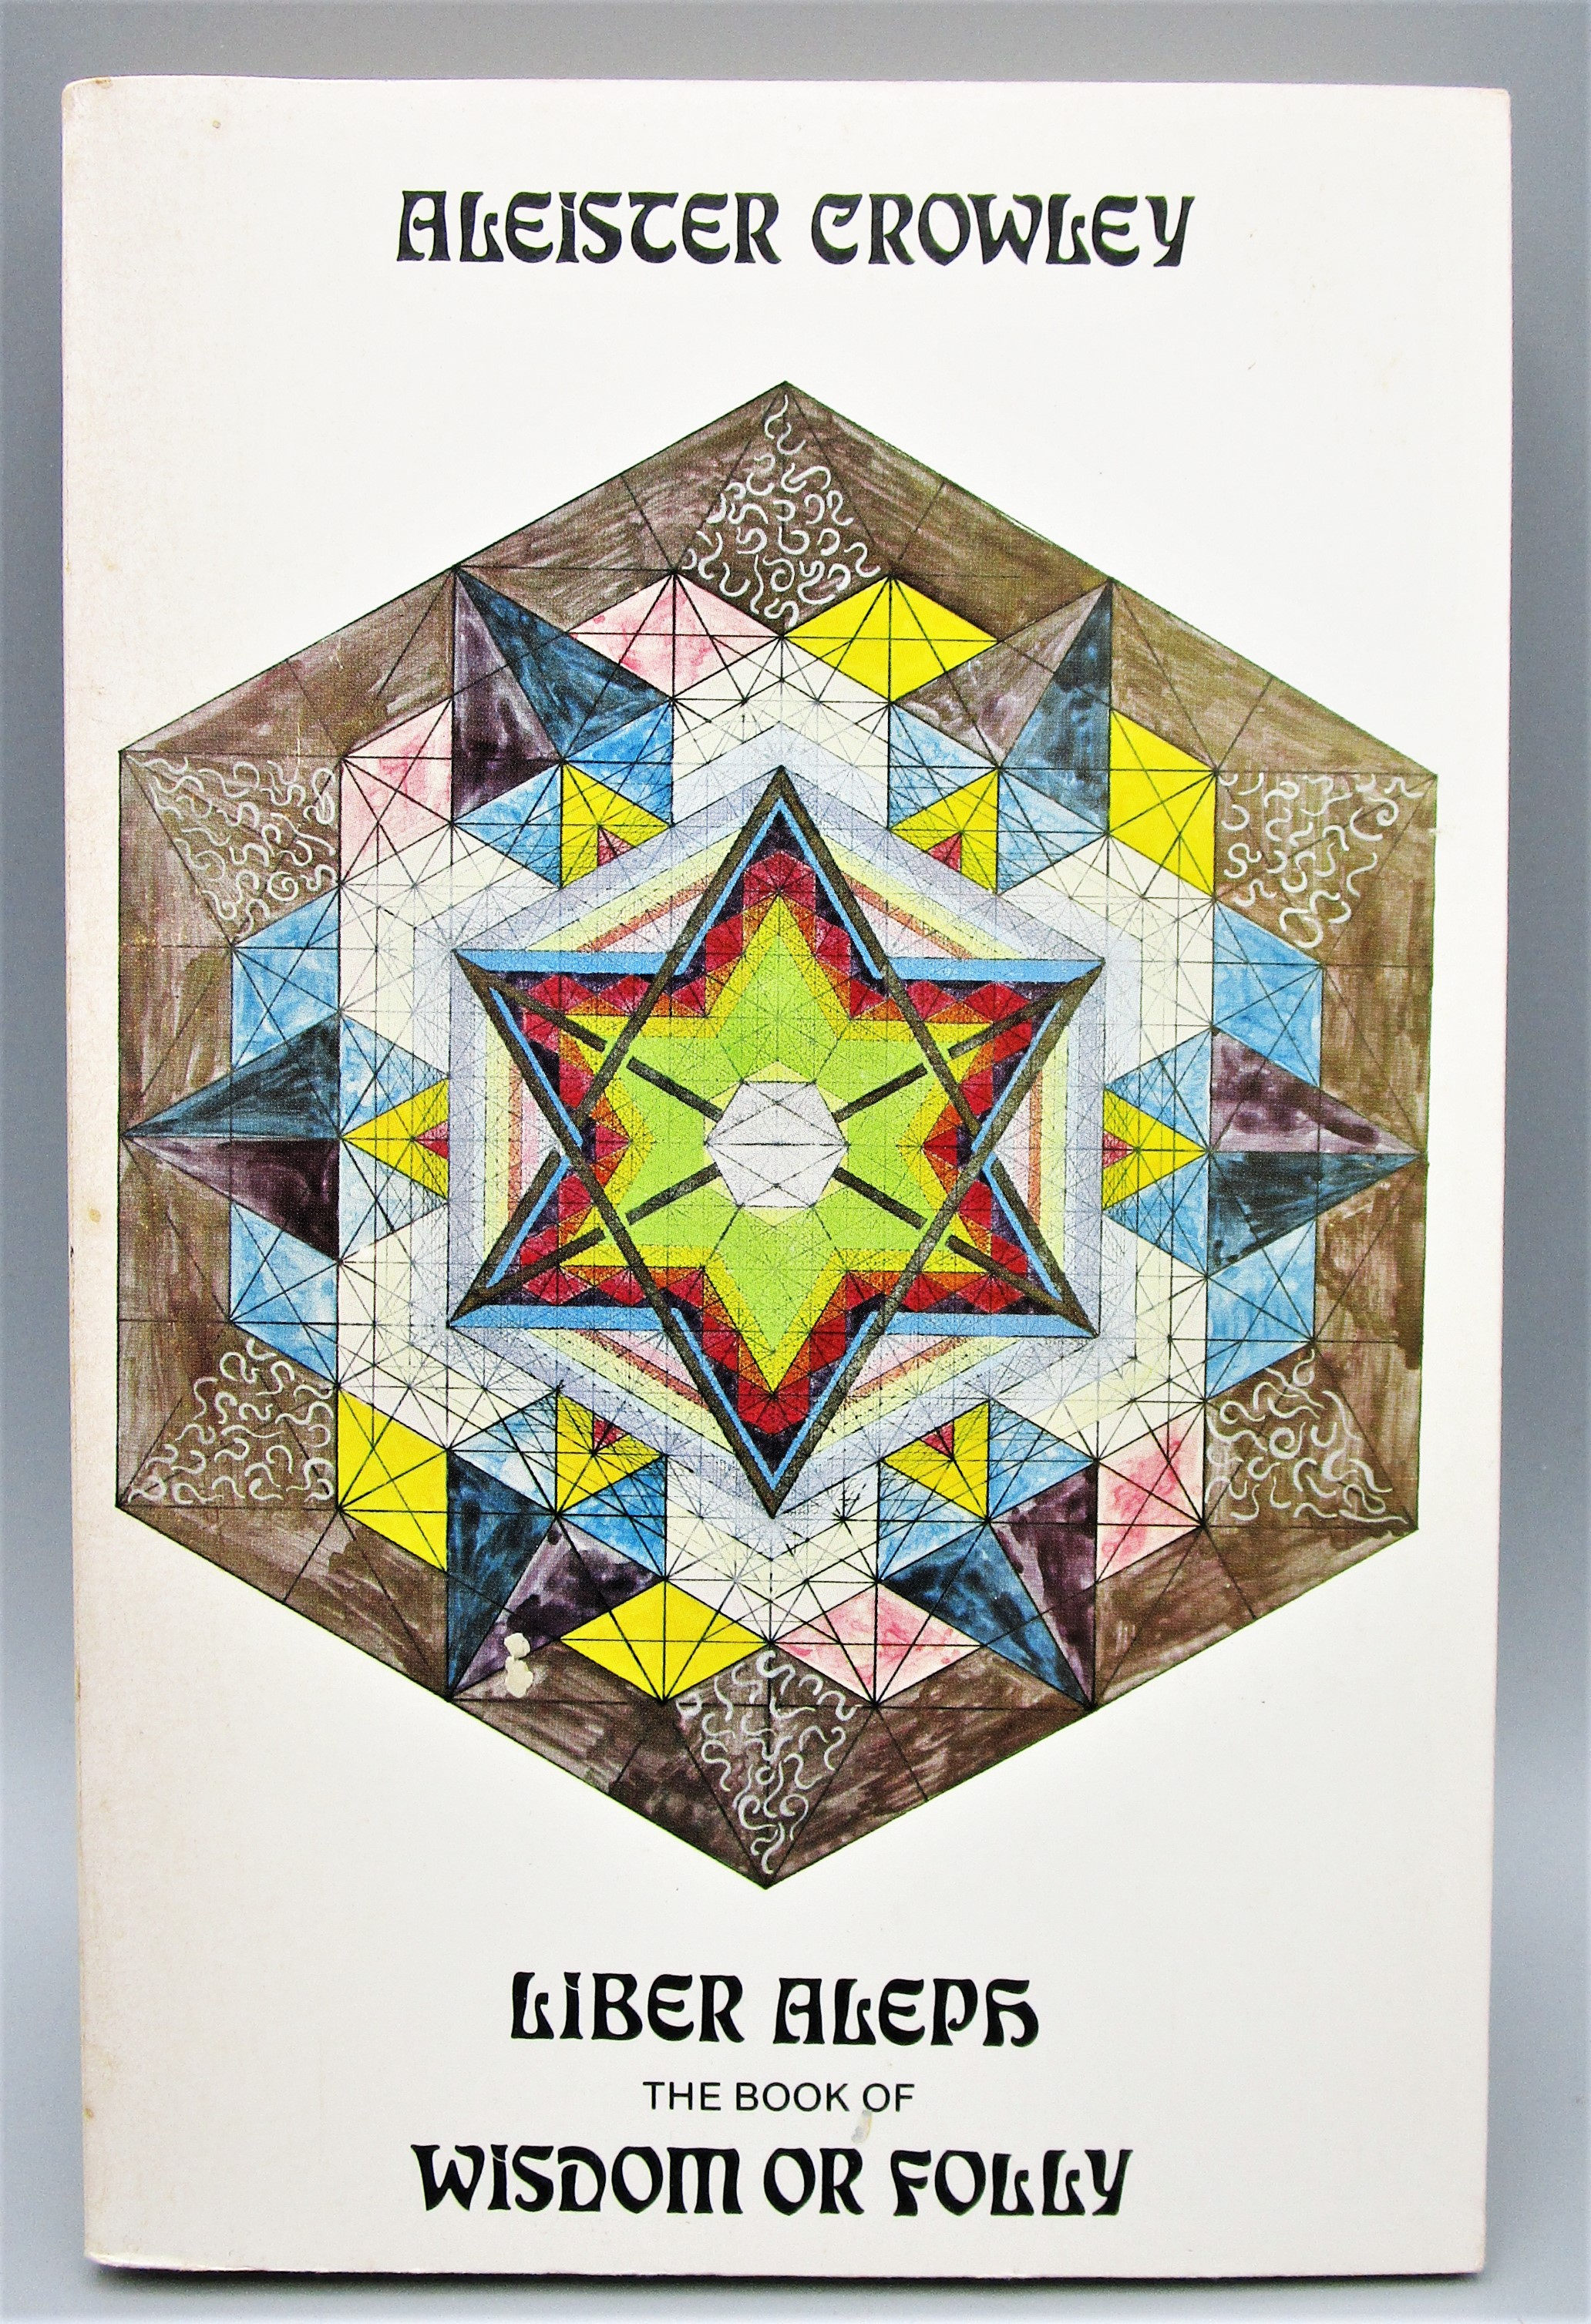 LIBER ALEPH: WISDOM OR FOLLY, by Aleister Crowley - 1974